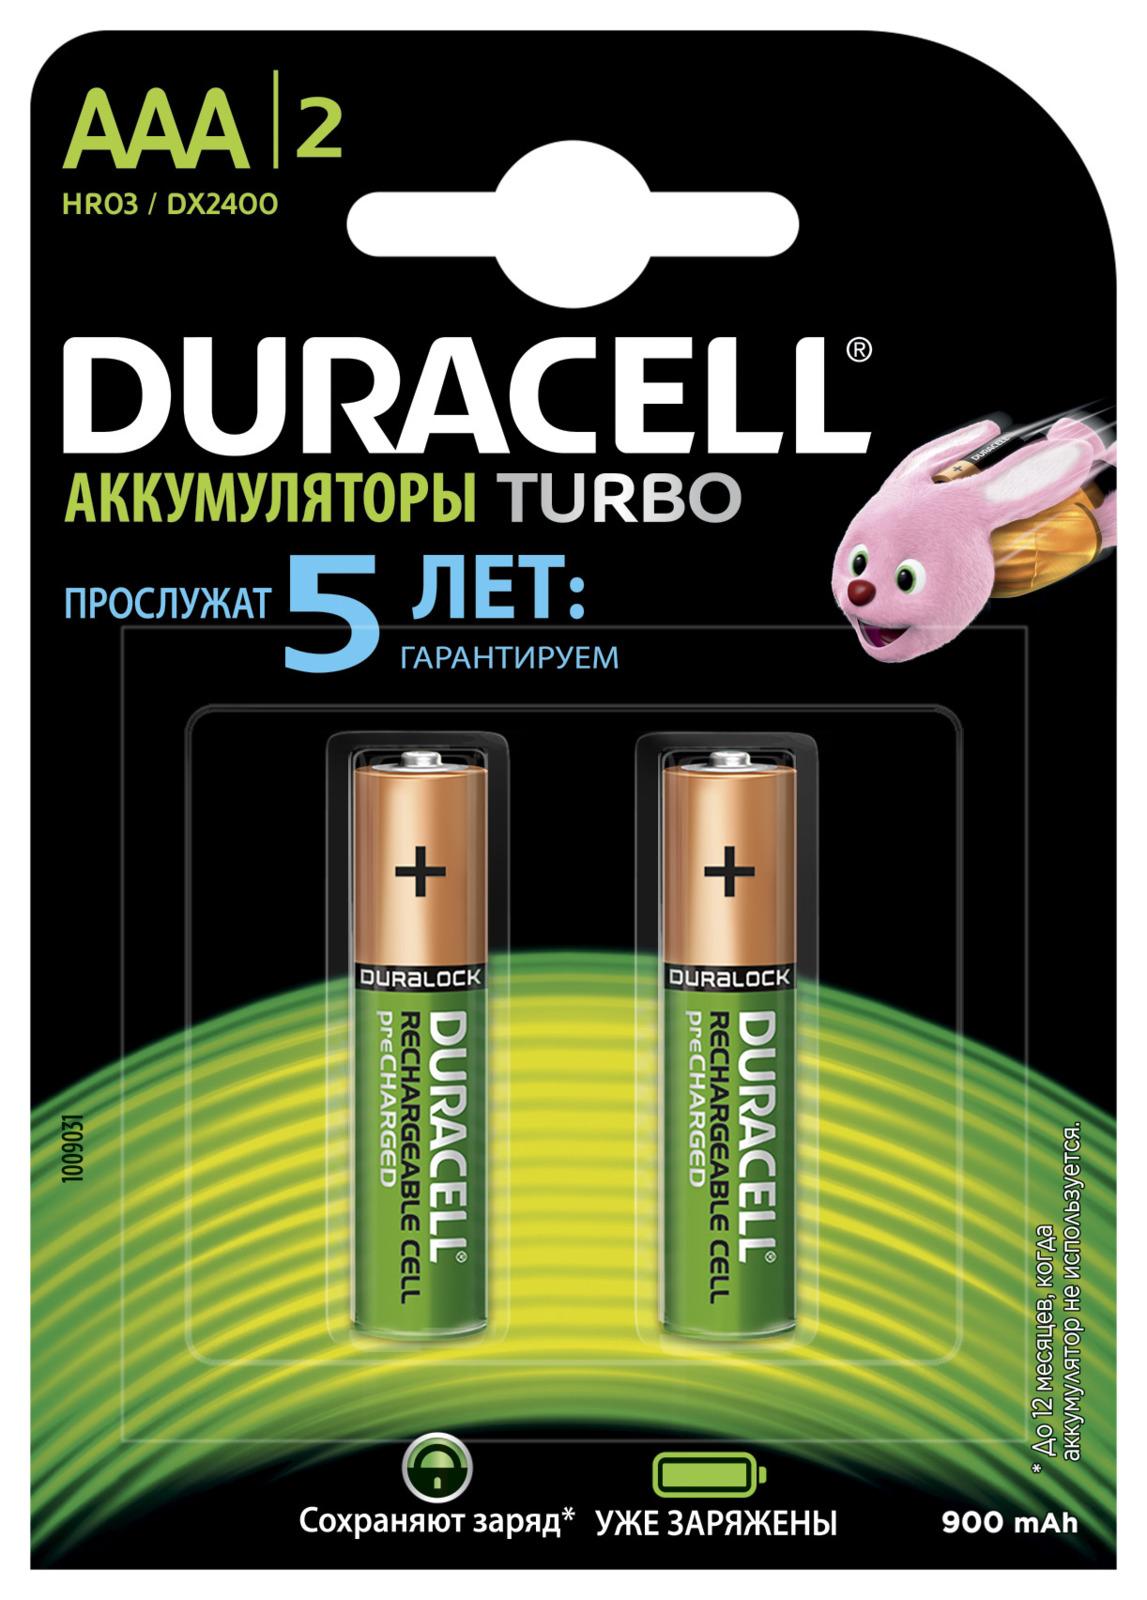 Аккумуляторы Duracell Recharge Turbo, ААА 850 мАч, 2 шт аккумуляторы для фотоаппаратов